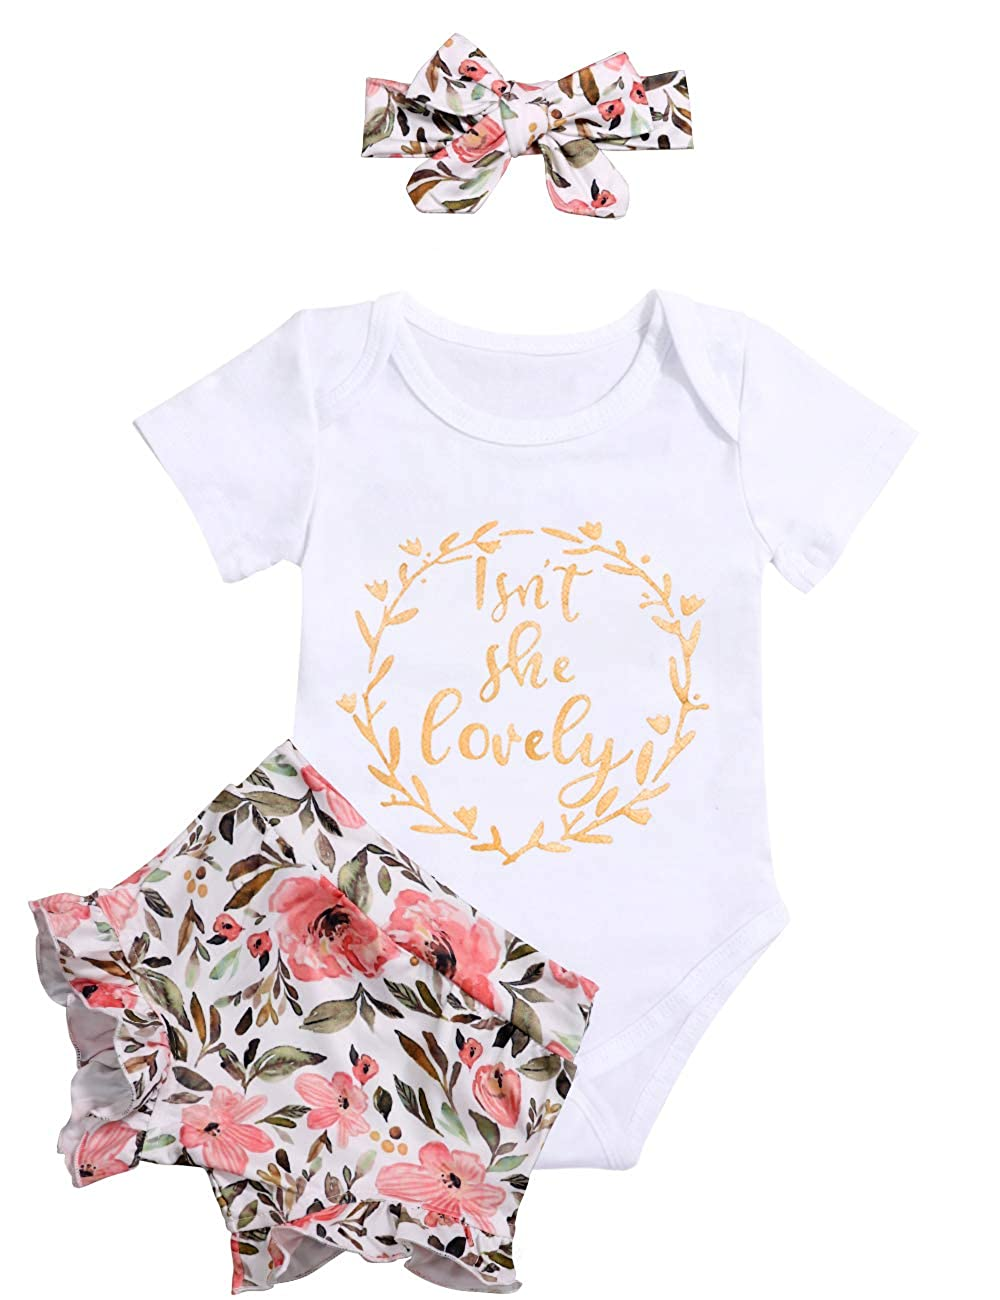 IWOKA 3Pcs Newborn Baby Girl Short Sleeve Letters Romper Jumpsuit+Pant Shorts+Headband Bodysuit Outfit